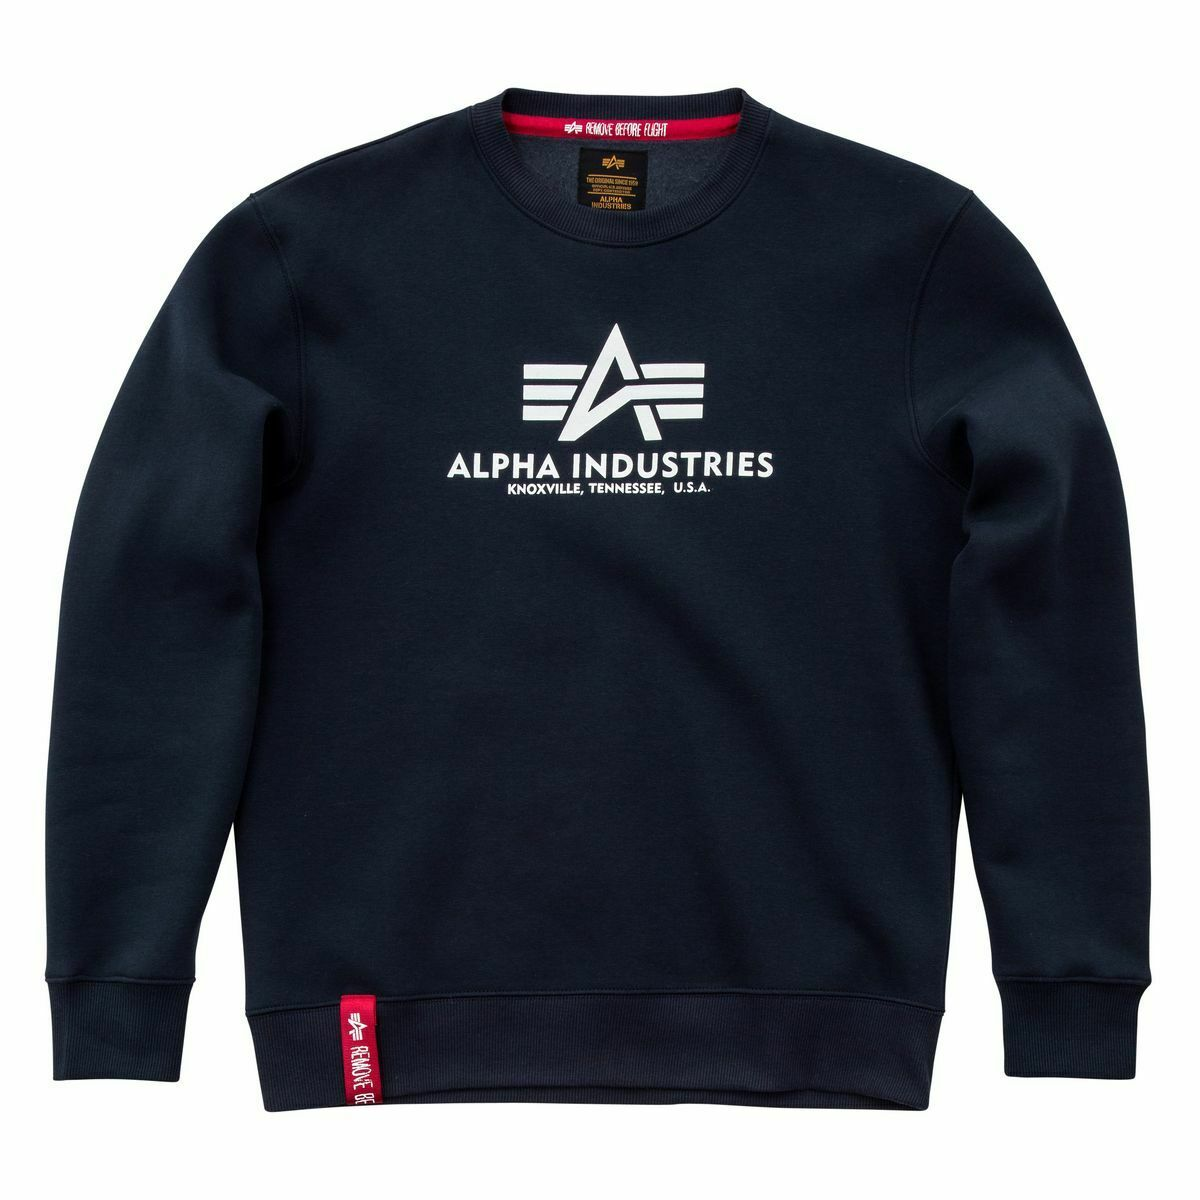 Alpha Industries Basic Sweater Hoodies / Sweatshirts Navy